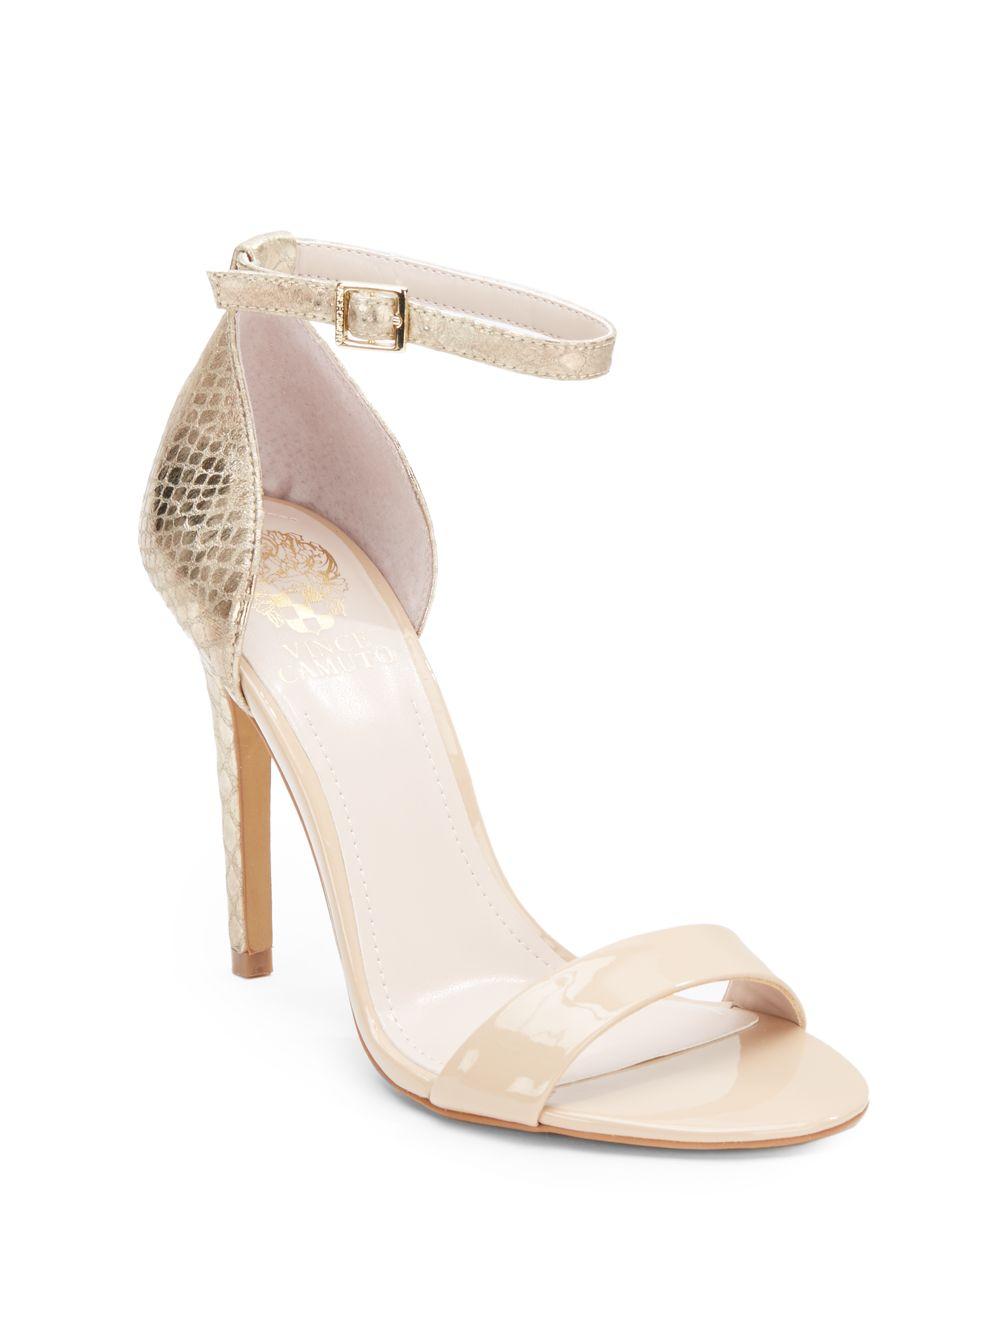 195e0d677c2 Lyst - Vince Camuto Allison High-Heel Sandals in Metallic